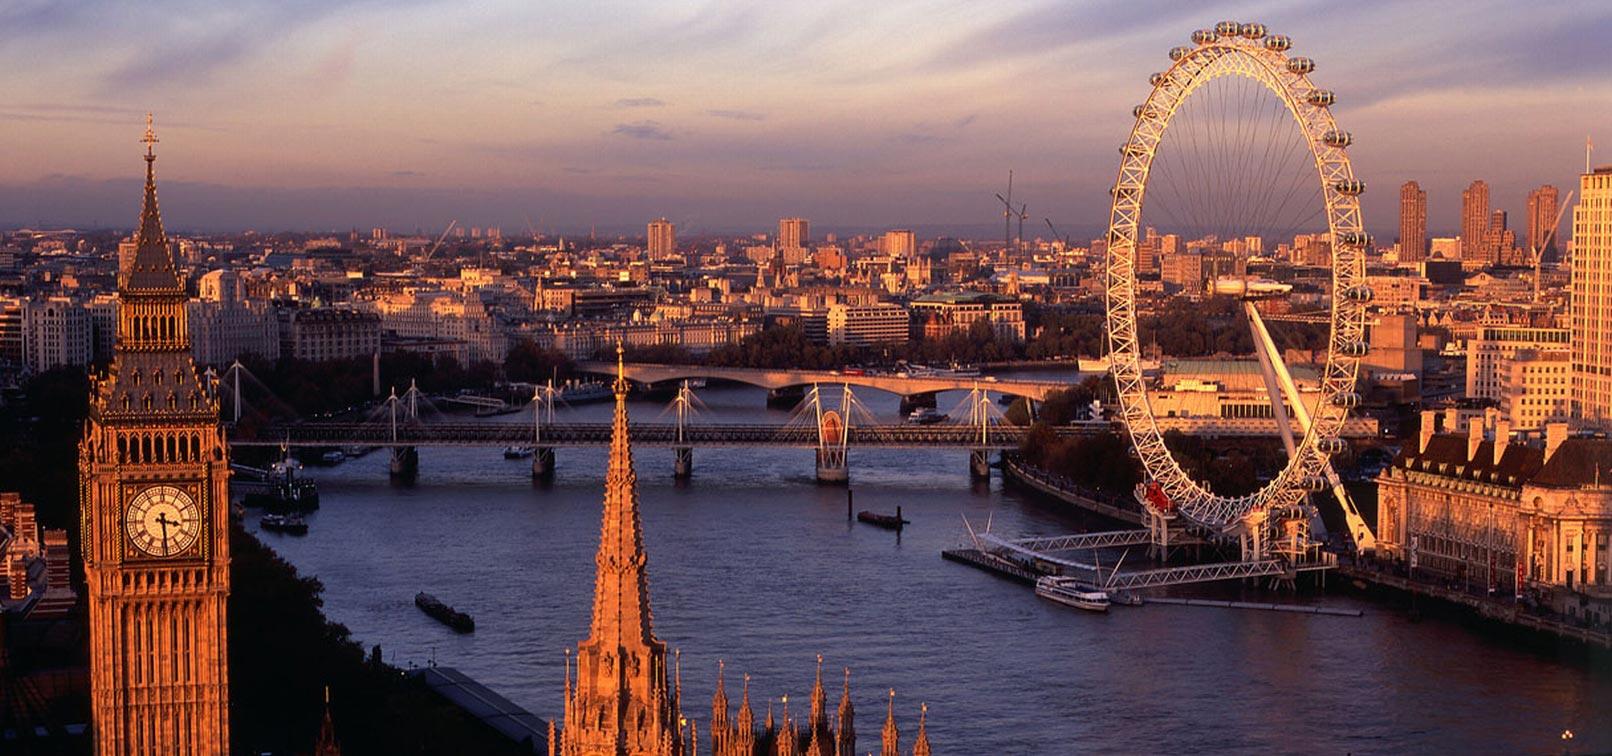 London Wins Bid To Host Sibos 2019